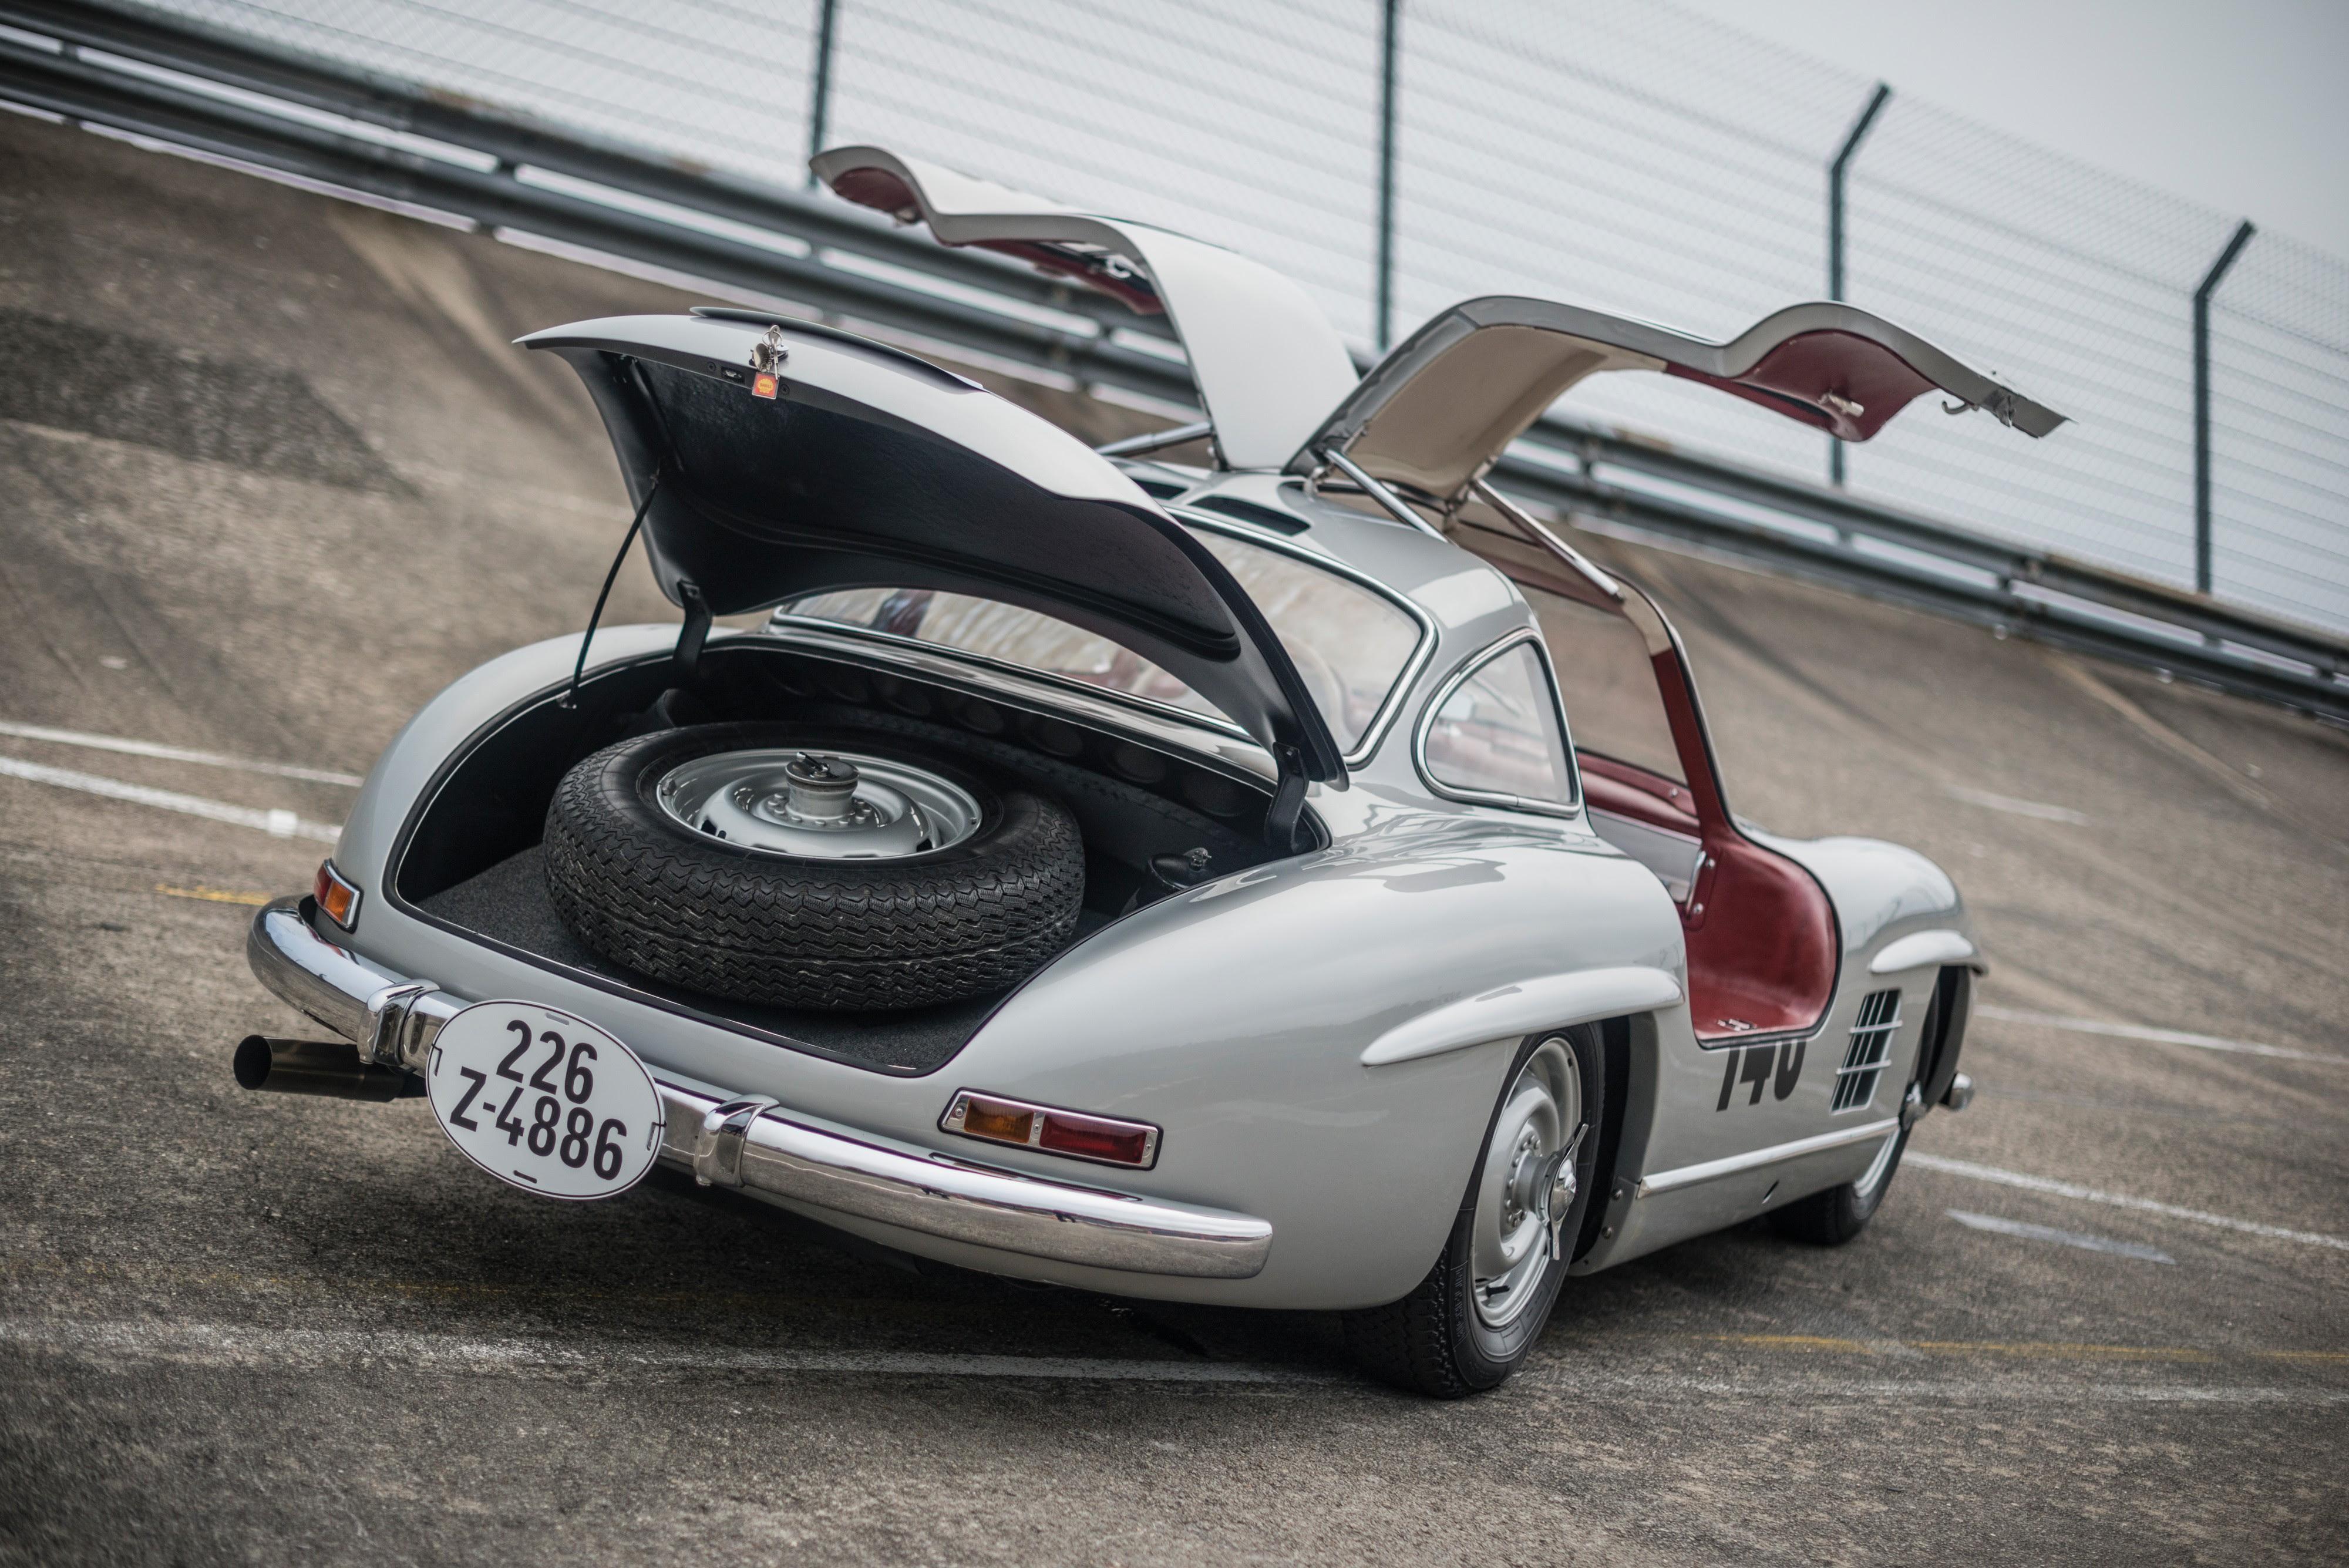 MERCEDES BENZ 300 SL Coupe (W198) - 1954, 1955, 1956, 1957 ...